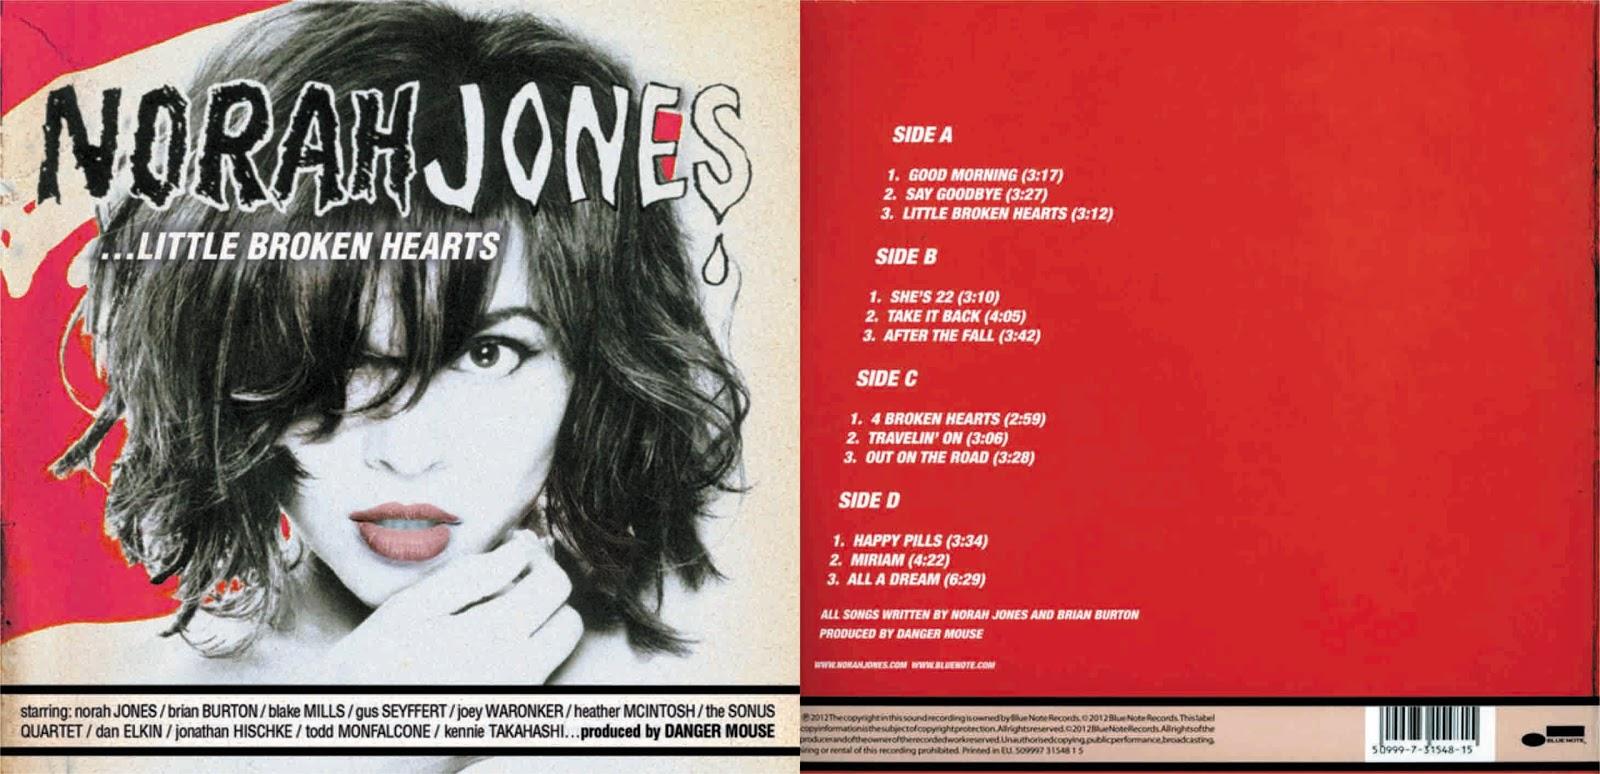 http://3.bp.blogspot.com/-HQZ51dQjikc/UARIq0UMuEI/AAAAAAAAAVc/aXEZ9HWwOkc/s1600/norah+jones+little+broken+hearts.jpg